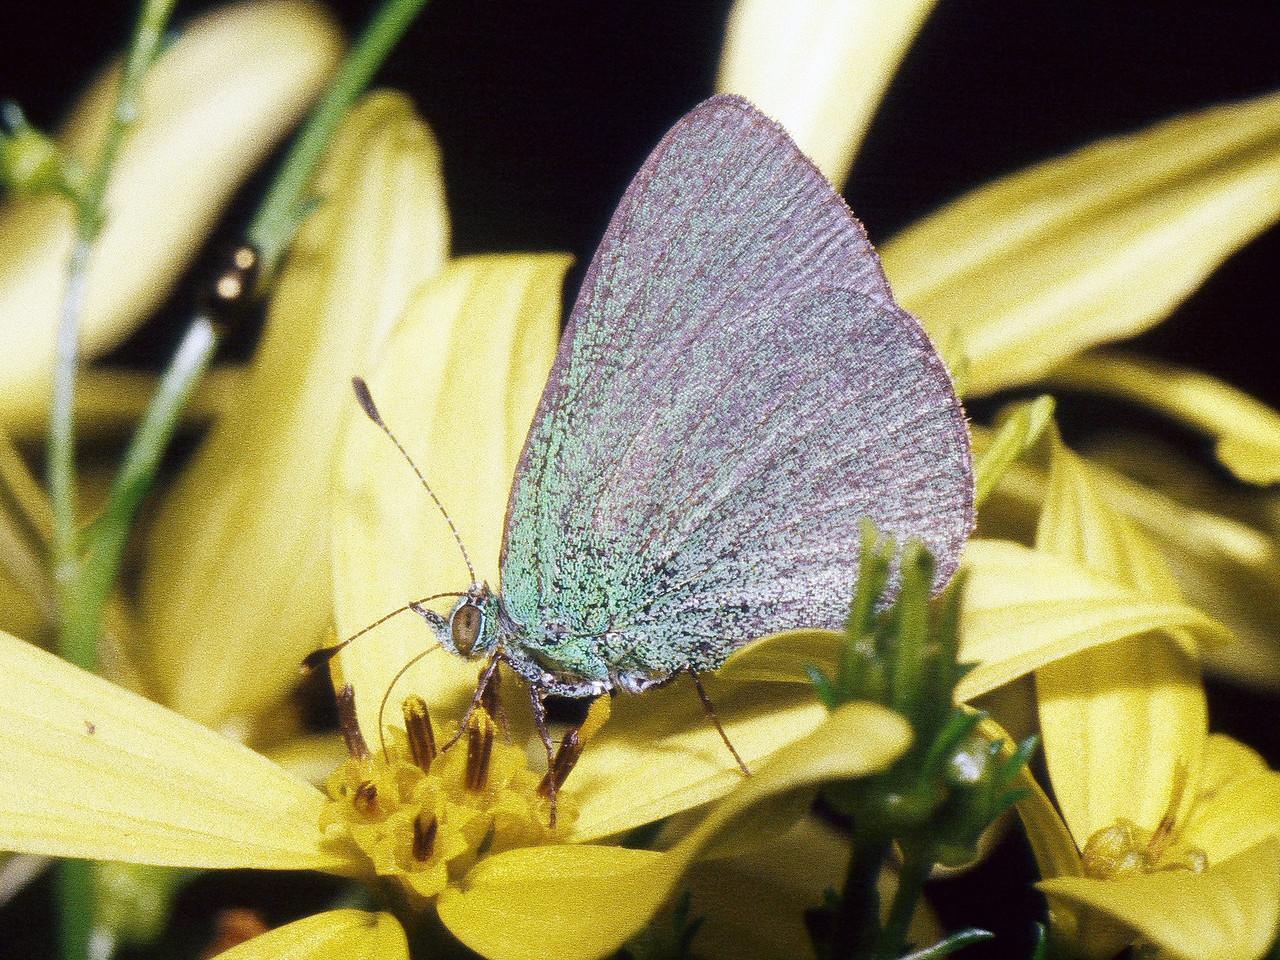 Udara blackburnii (Heteroptera: Lycaenidae) on Bidens menziesii West Maui